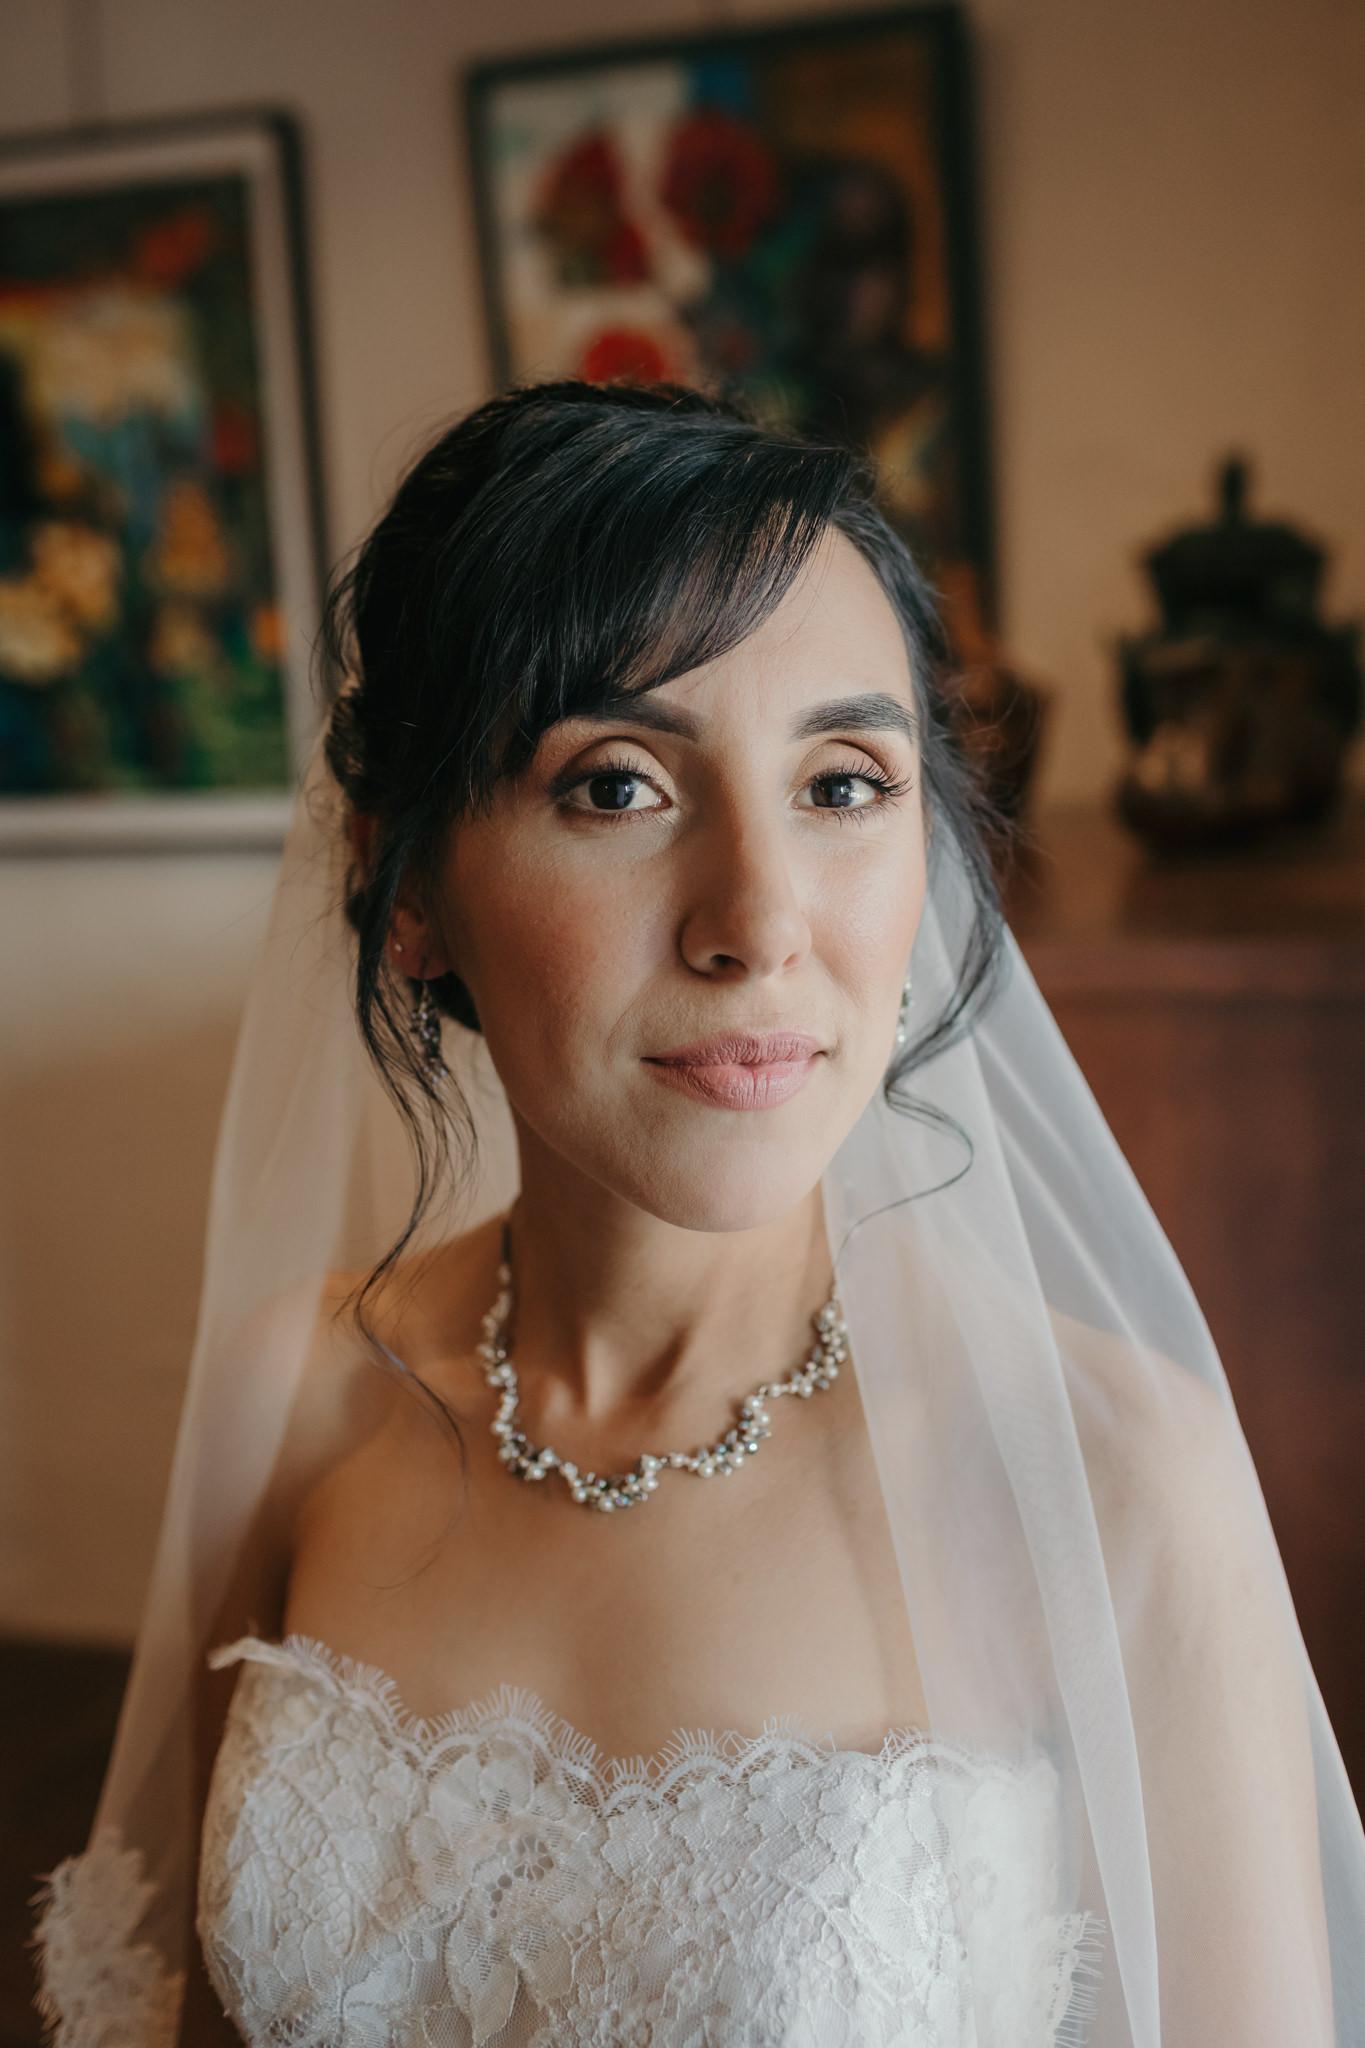 Bridal Portrait in Art gallery